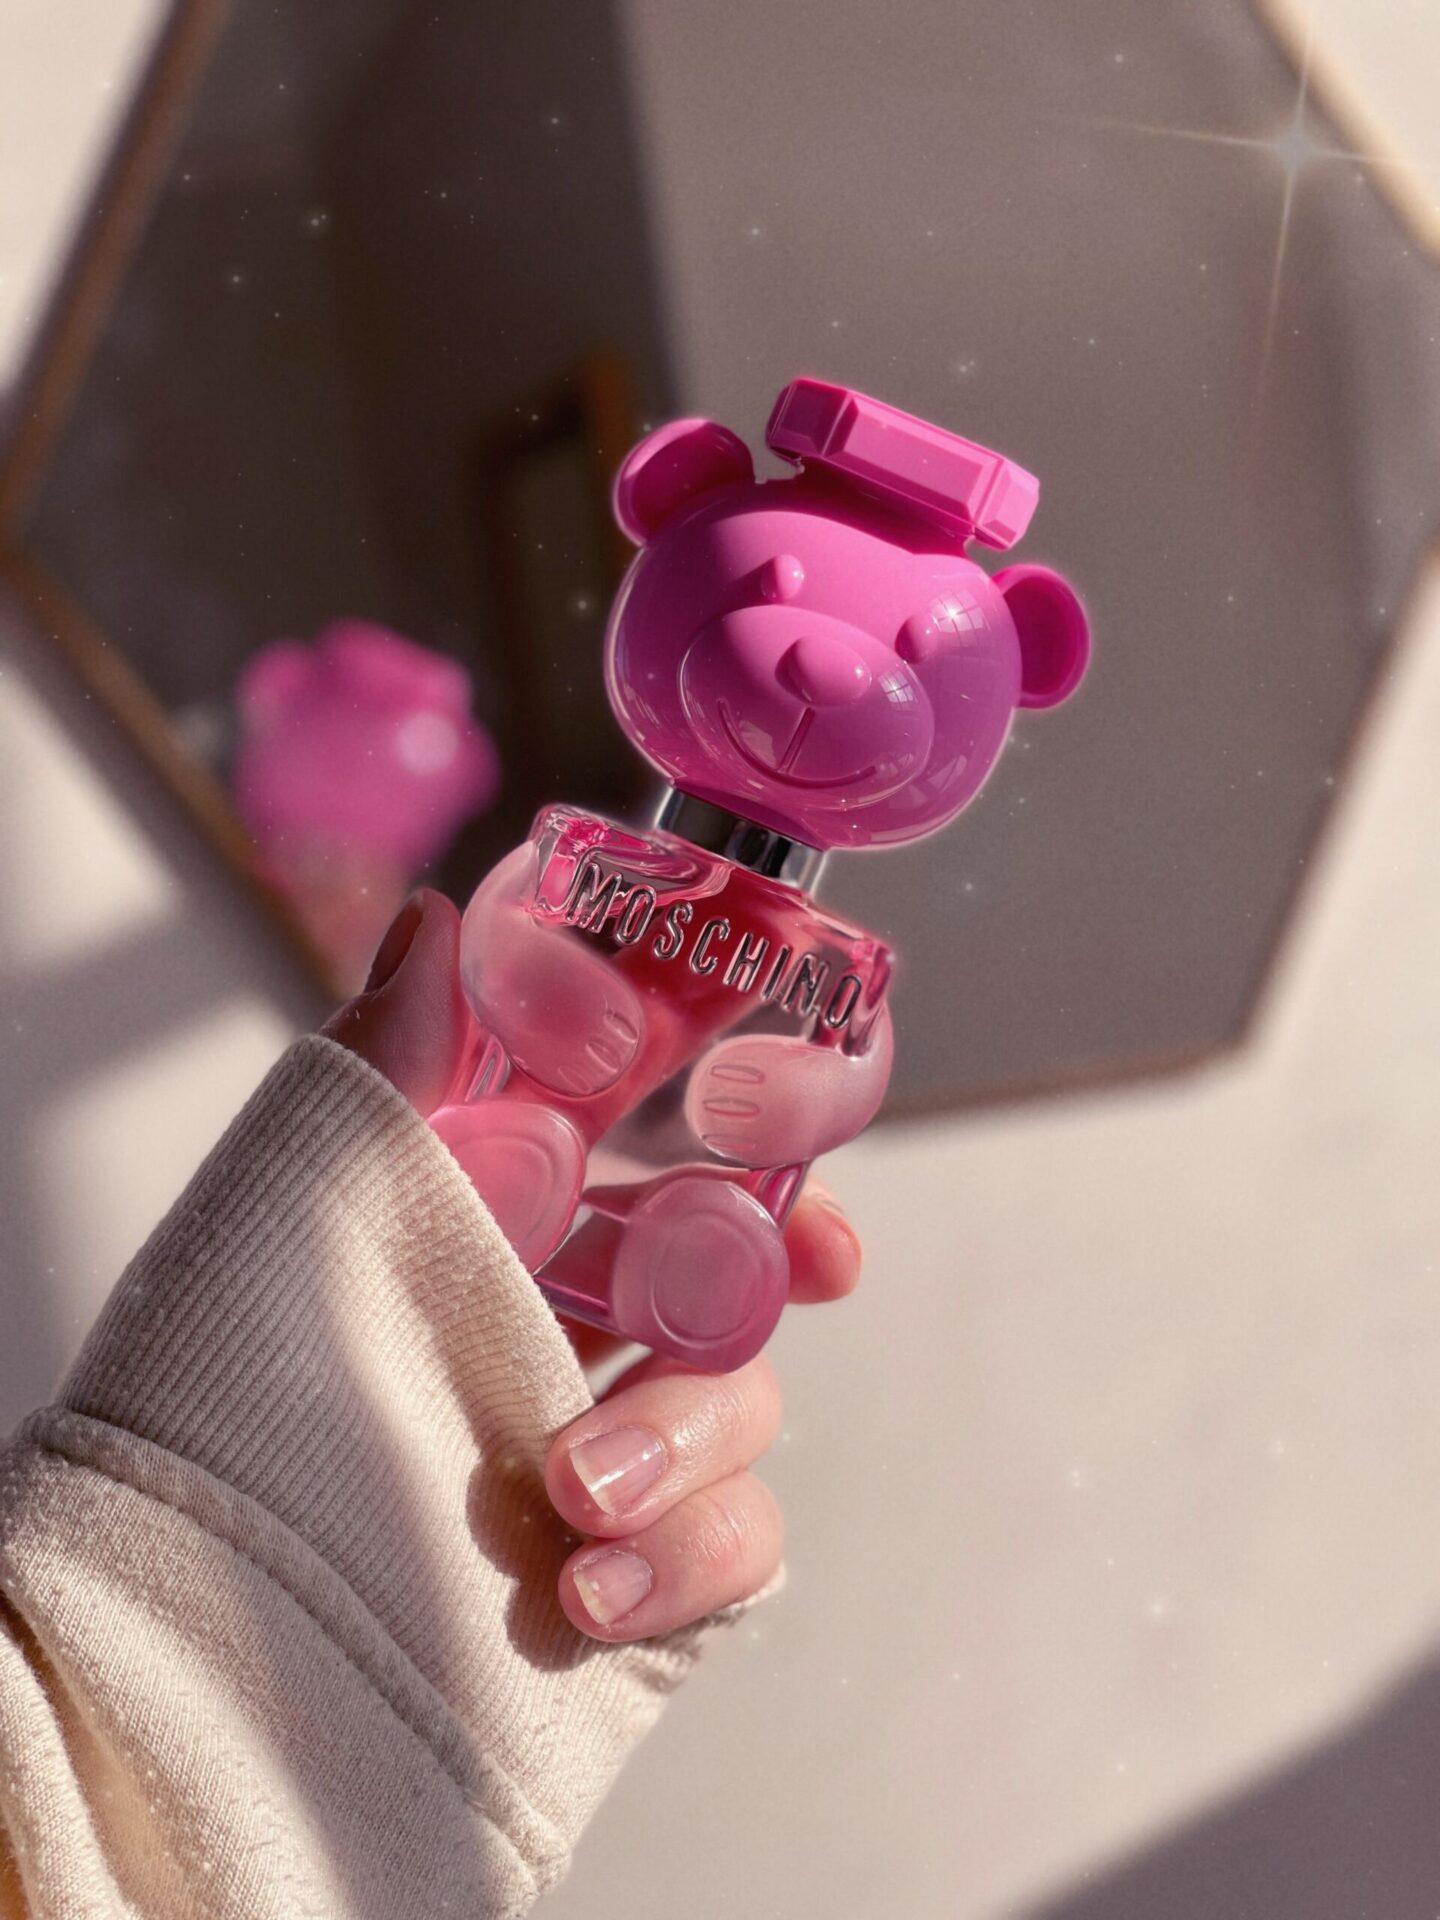 Moschino Toy 2 bubblegum review